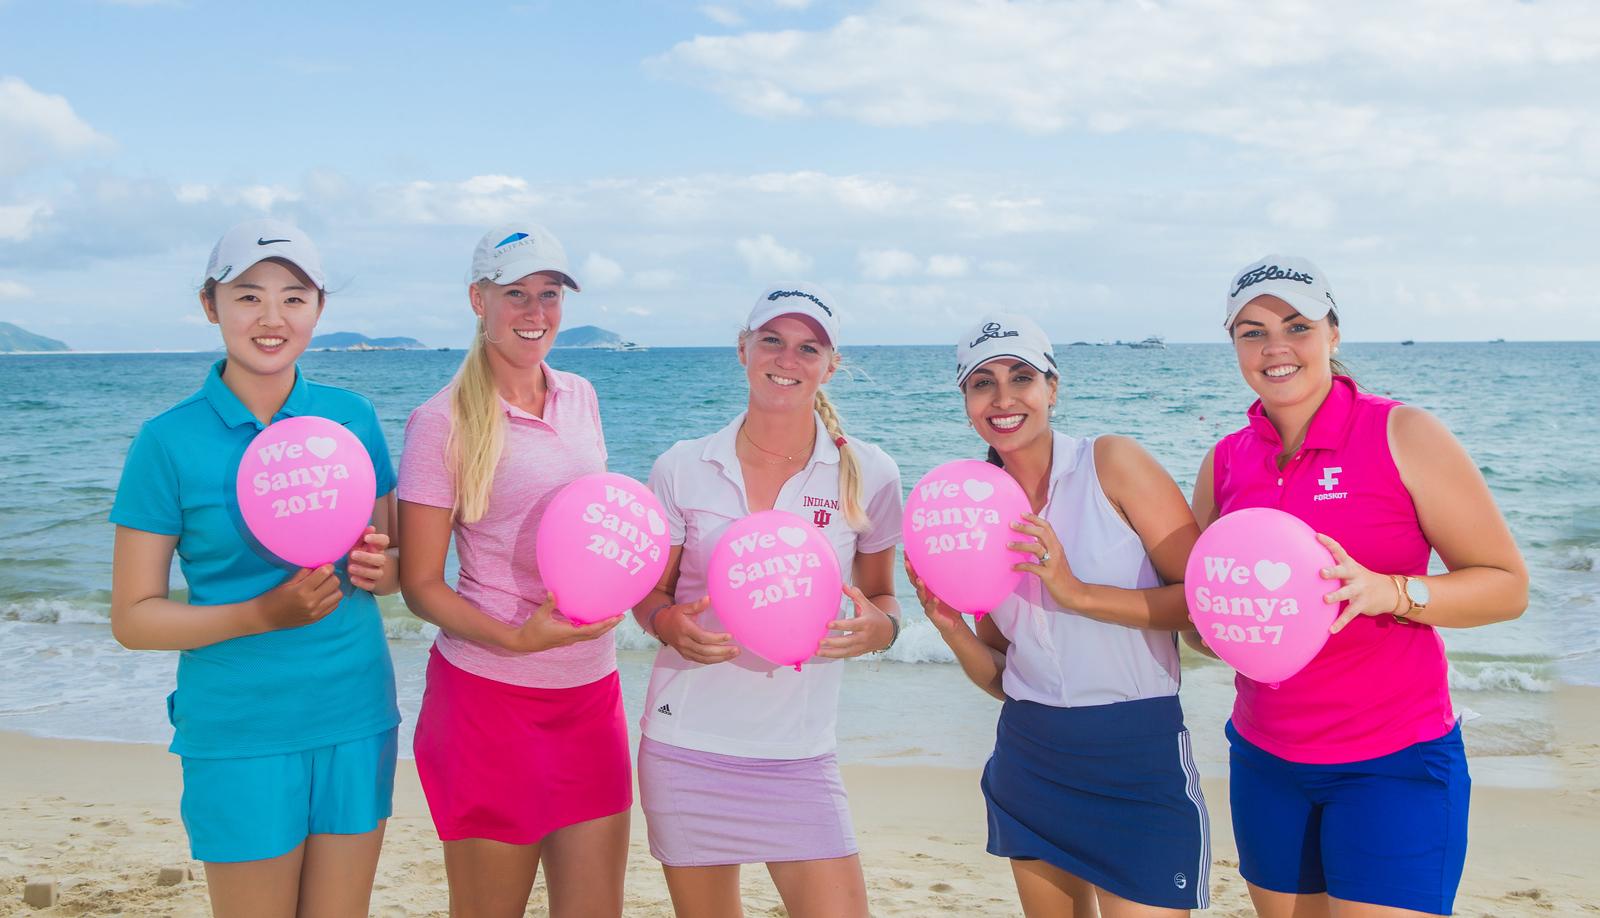 Simin Feng, Emma Nilsson, Camille Chevalier, Victoria Lovelady and Valdis Thora Jonsdottir,  at the Ritz Carlton Yalong Bay in Sanya, China